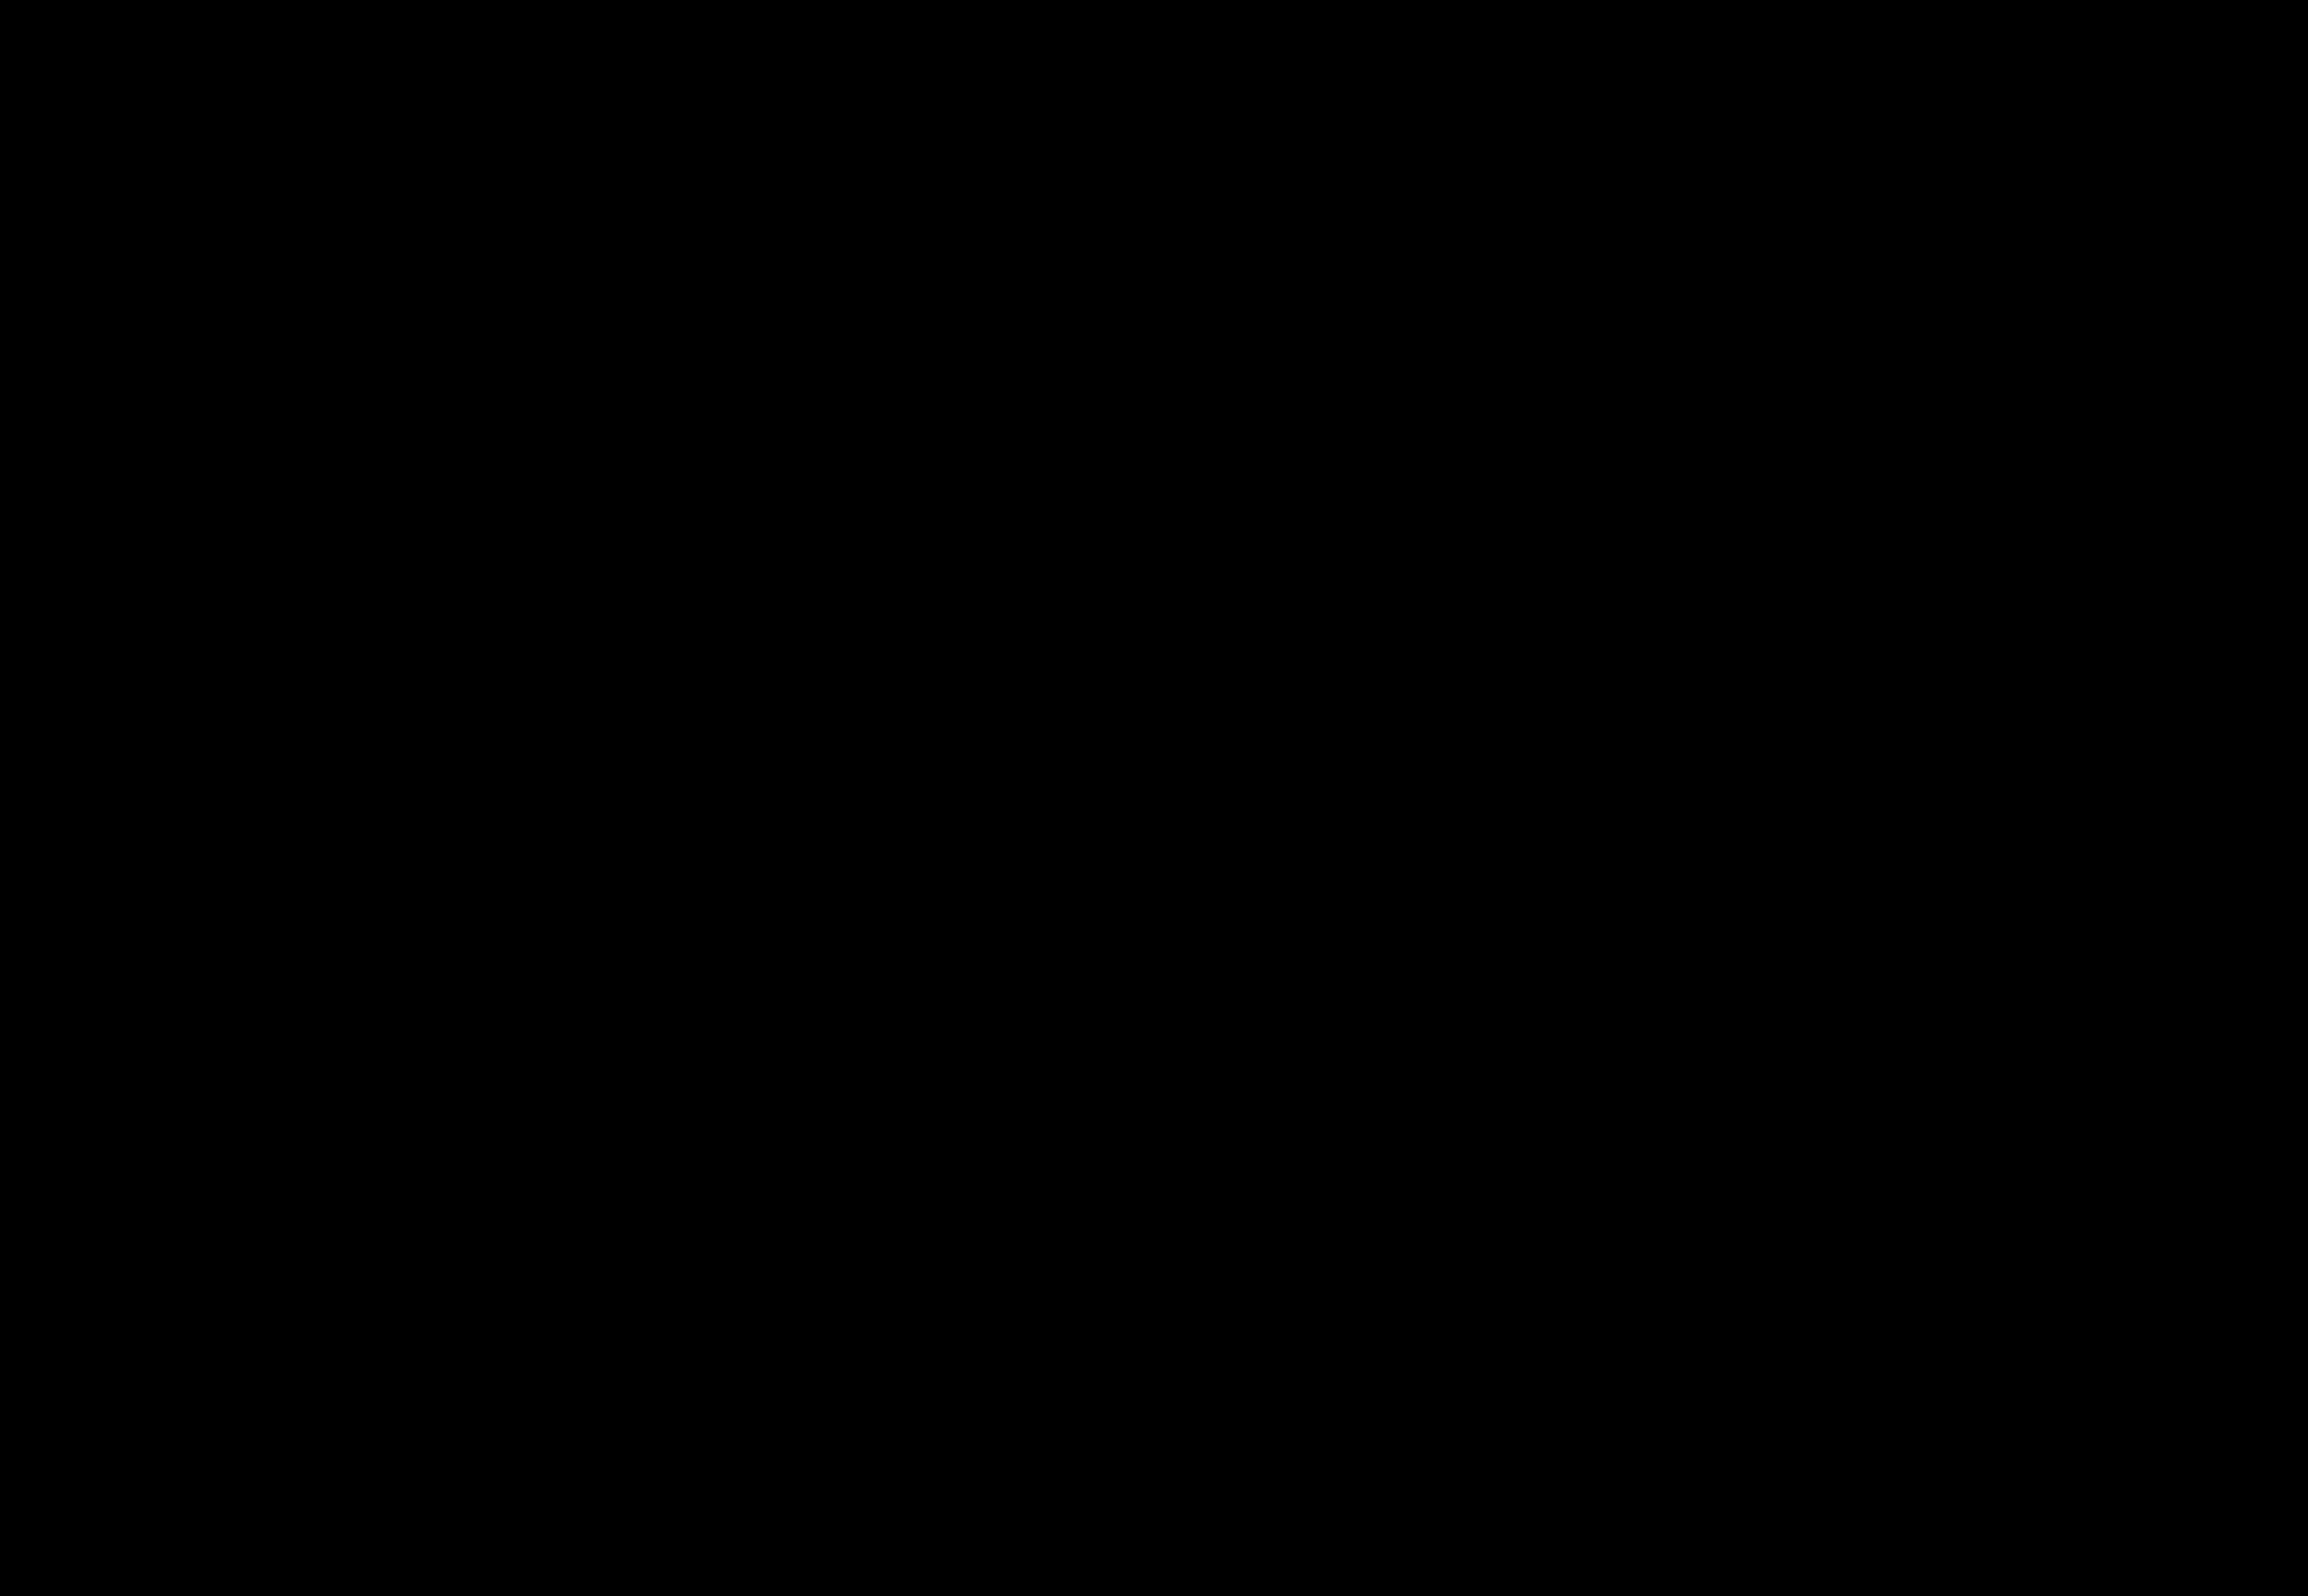 2400x1660 Clipart